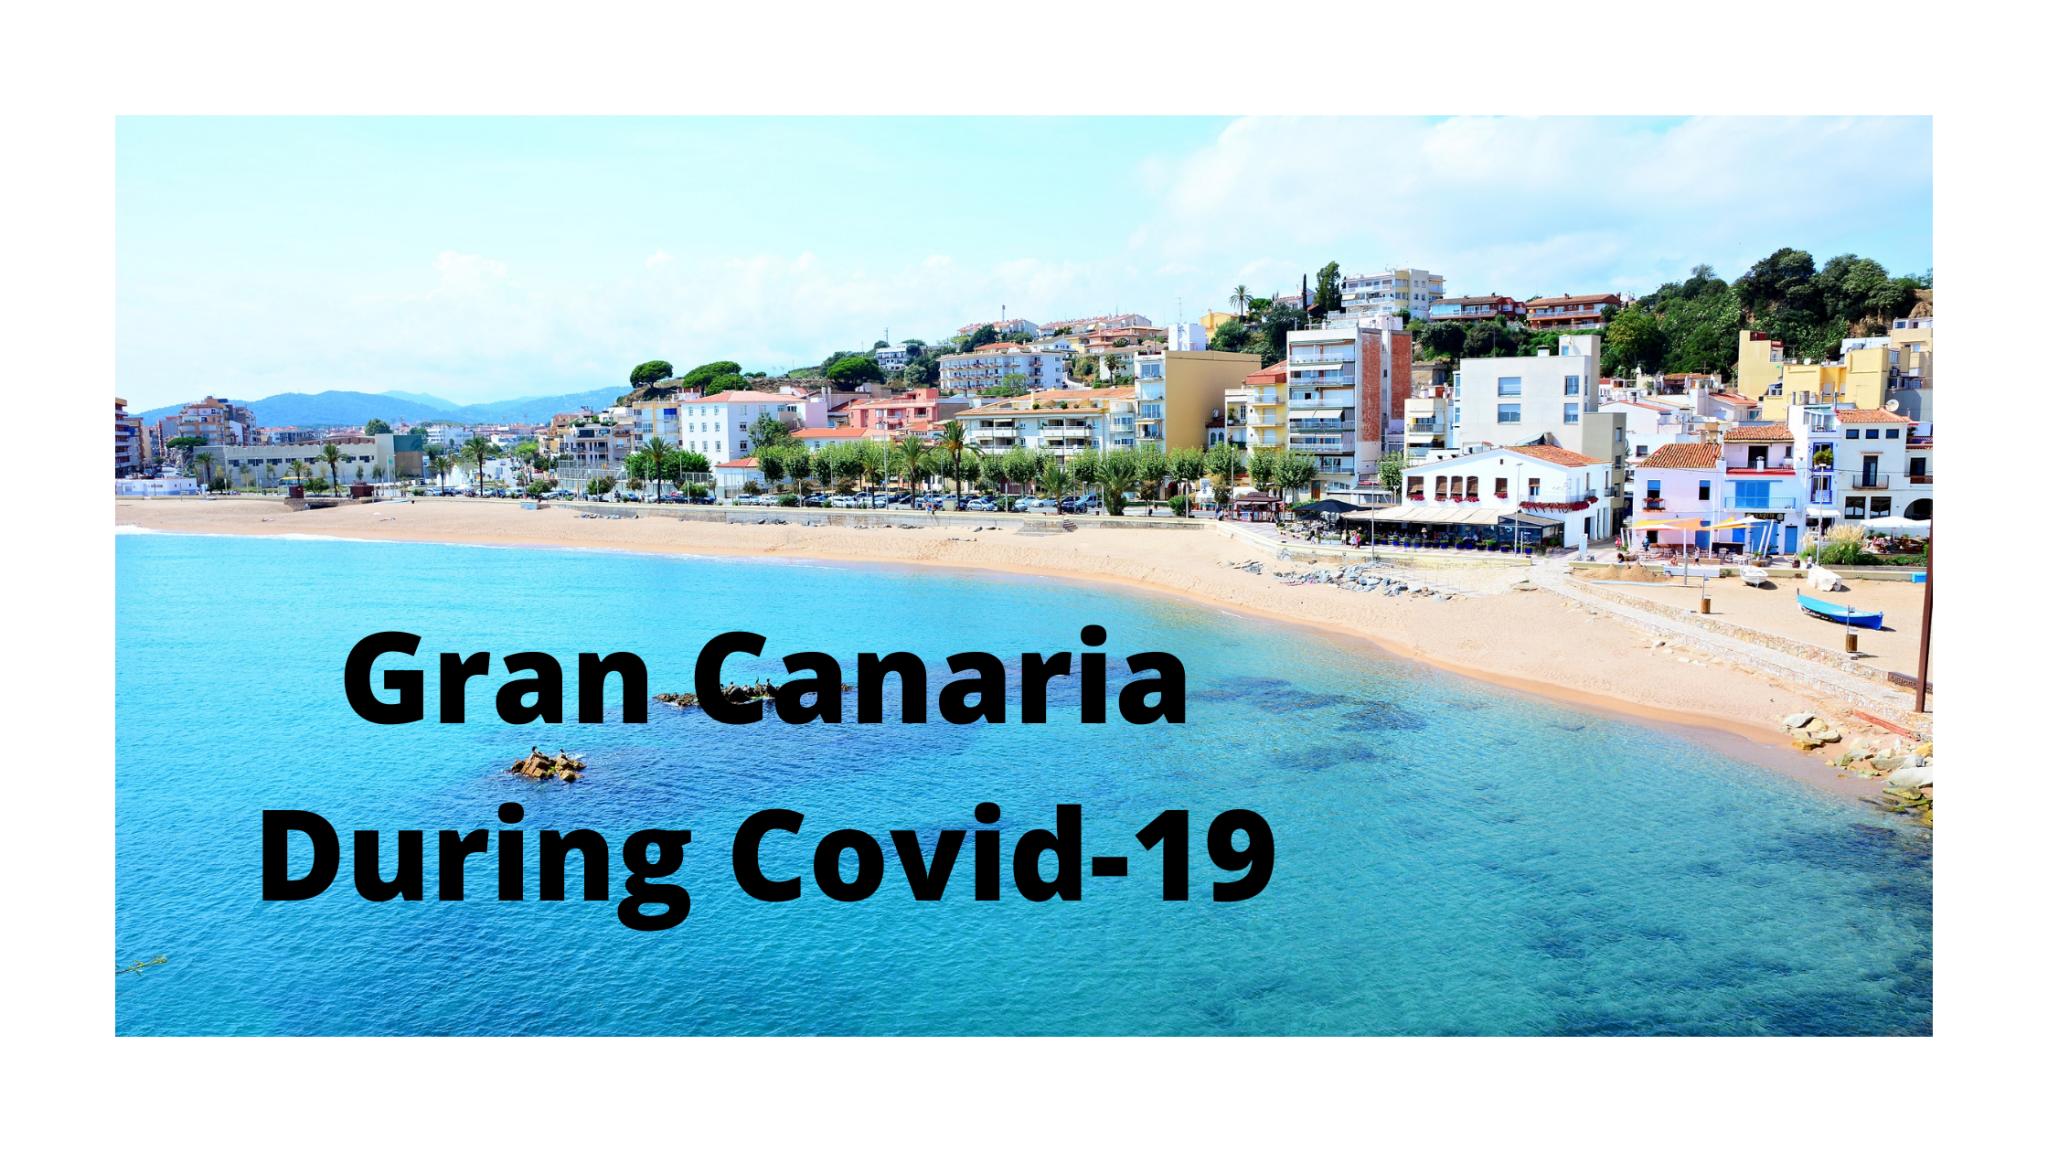 Gran Canaria During Covid-19